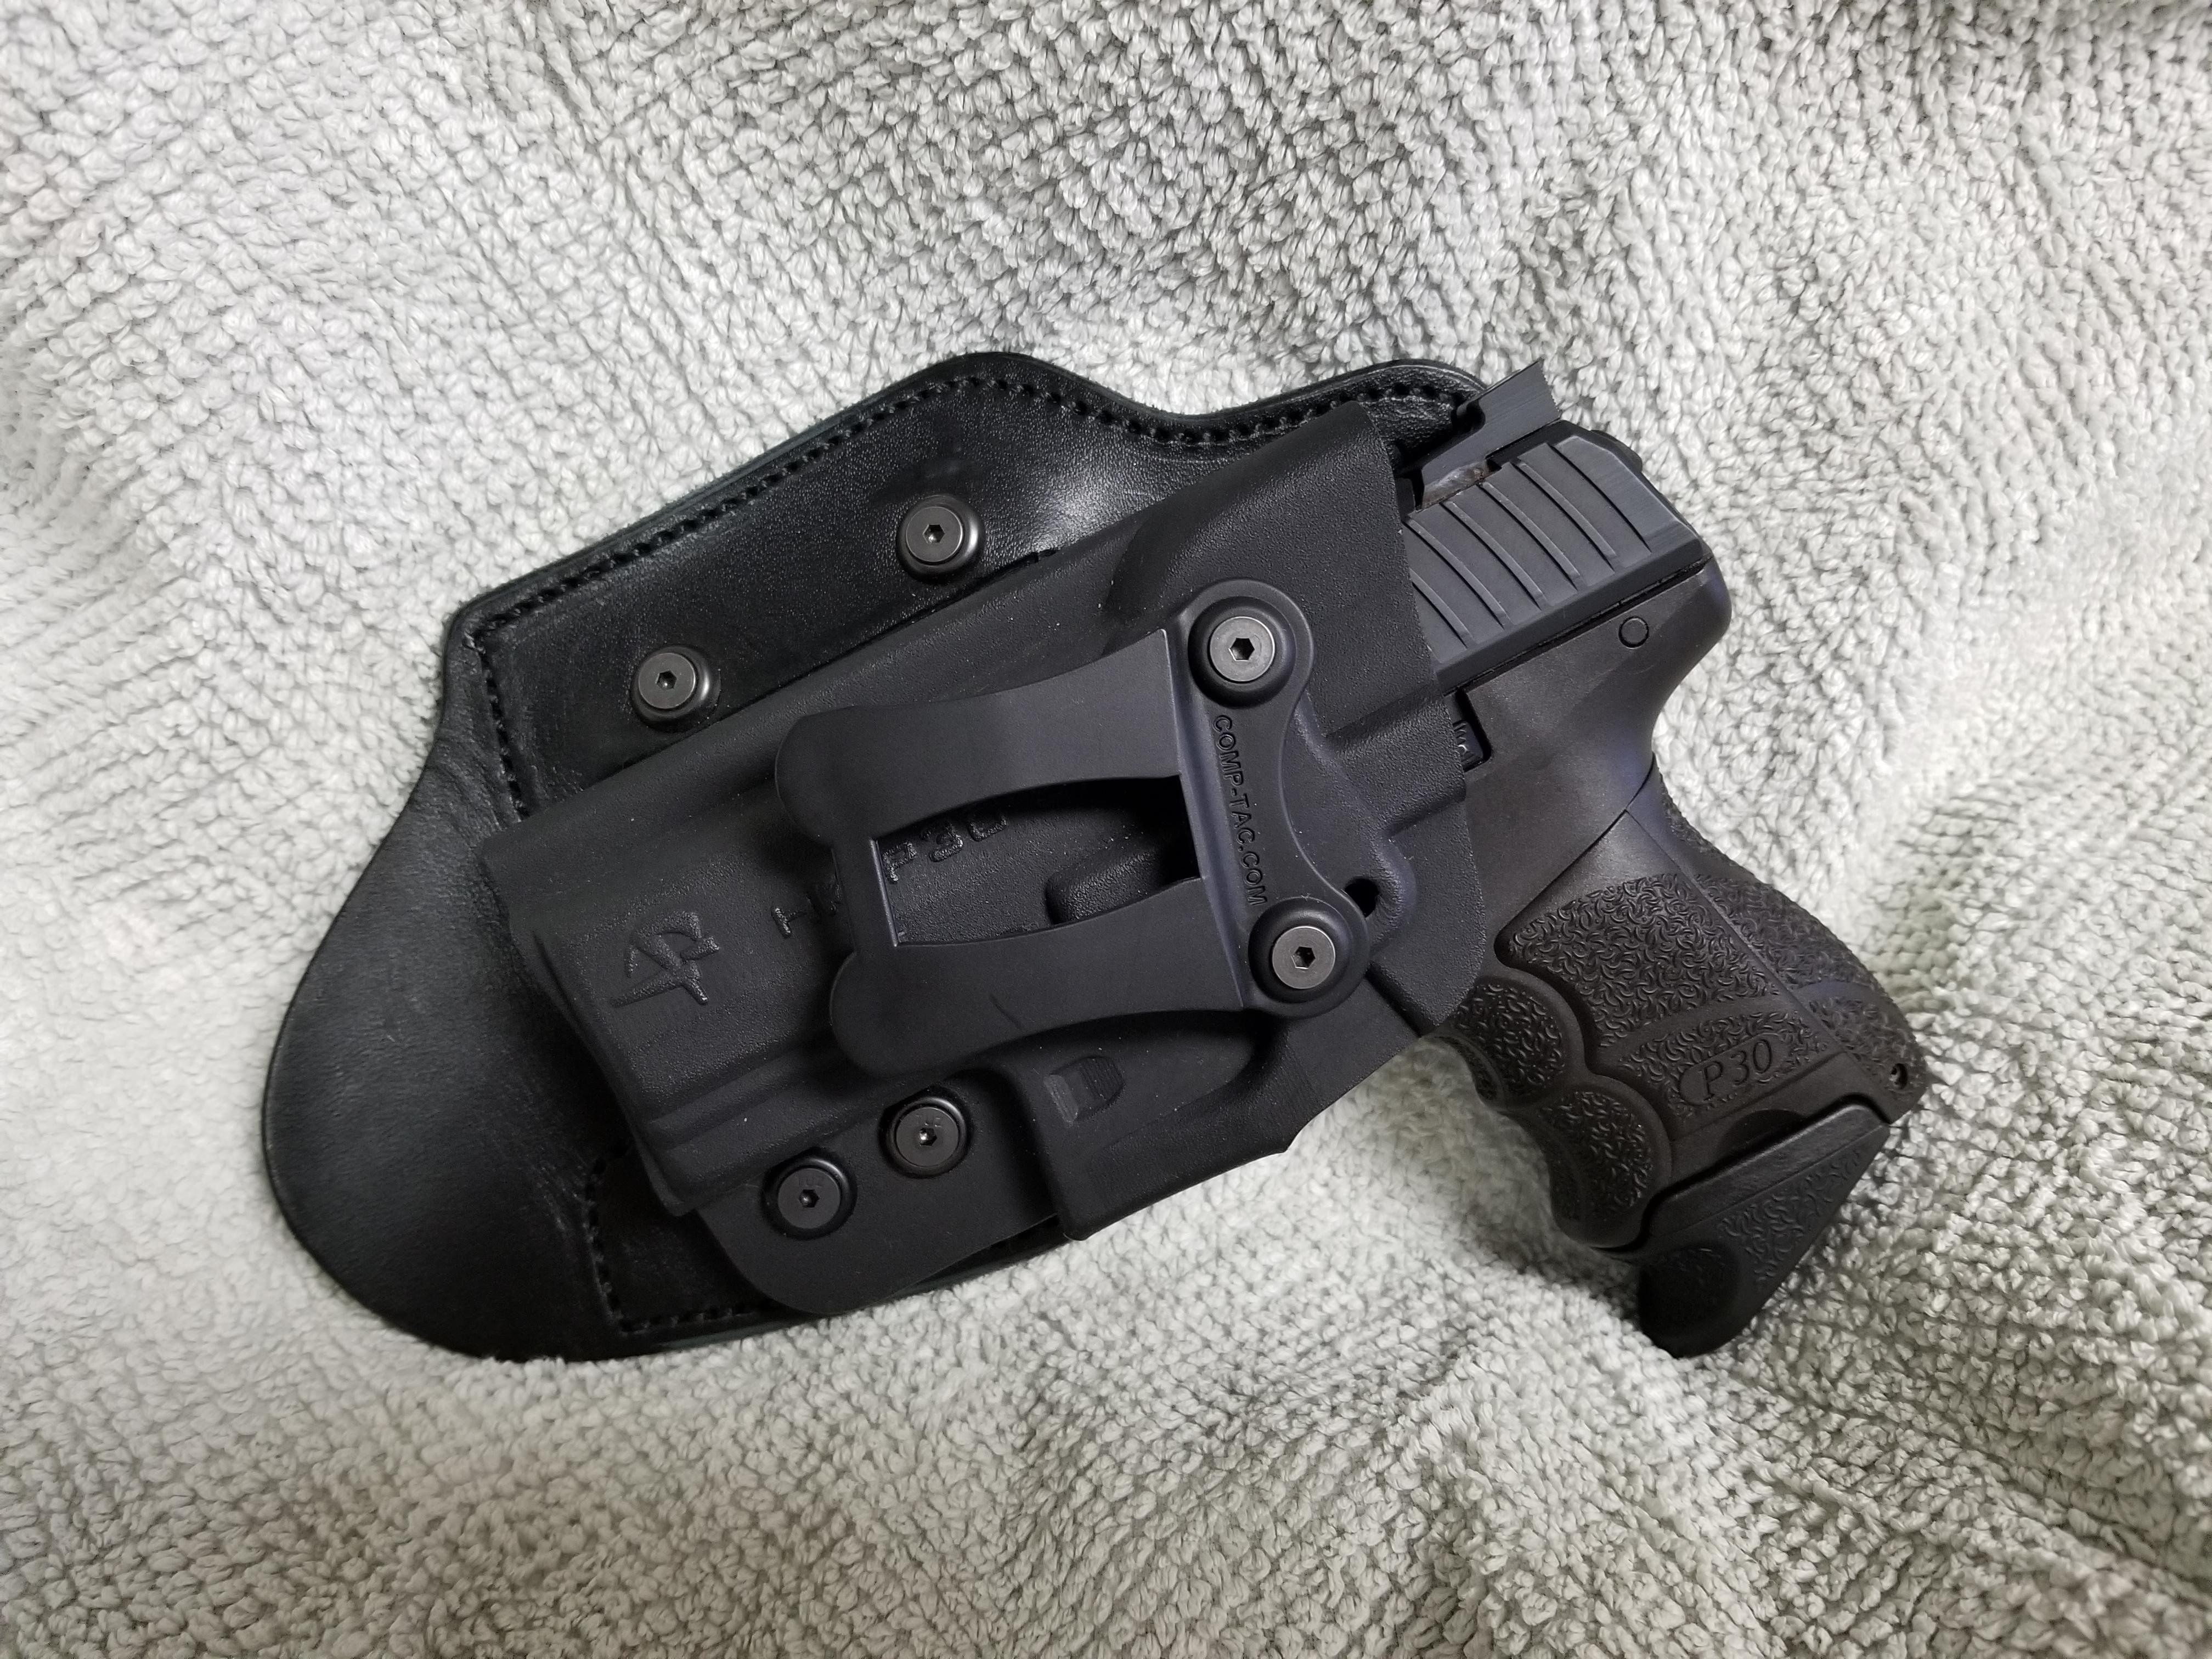 WTS: USP COMPACT 45 RH & P30SK LH holsters-20190131_170457.jpg